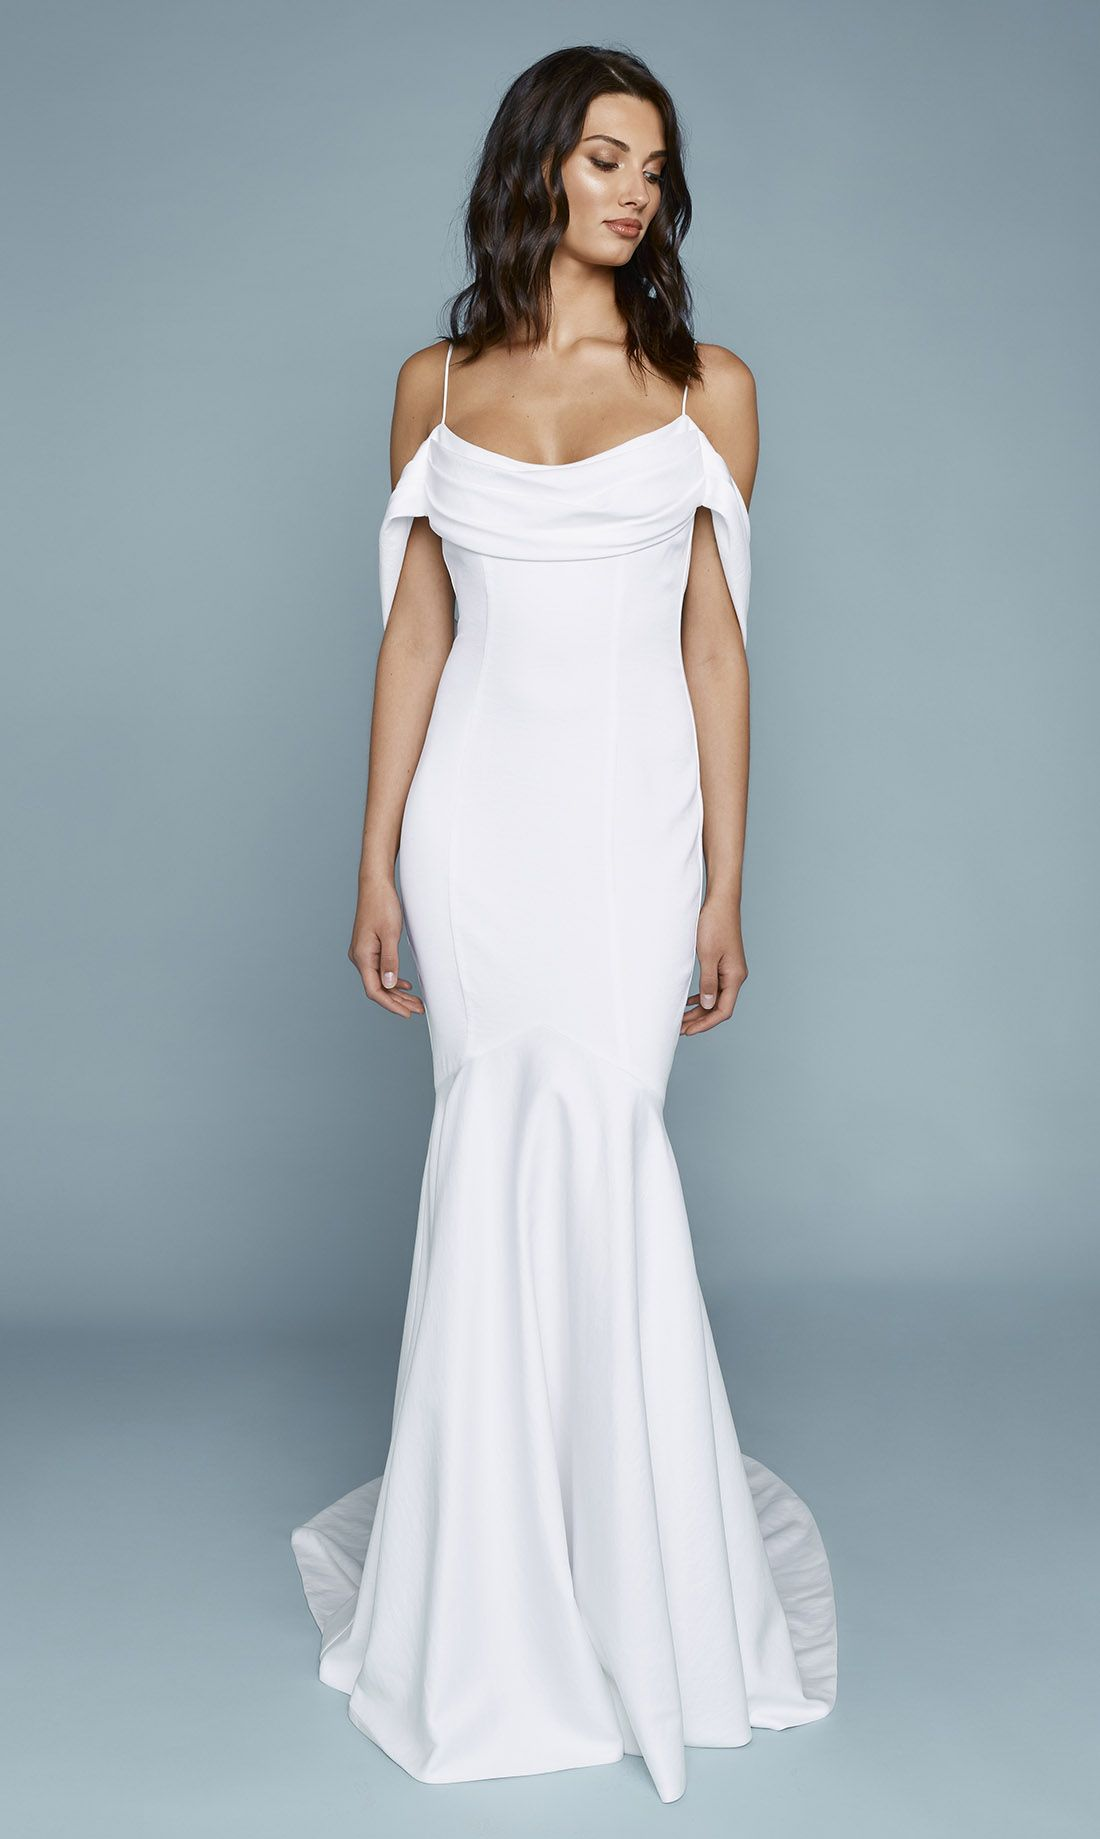 Marbella Gown   Weddings, Wedding dress and Wedding